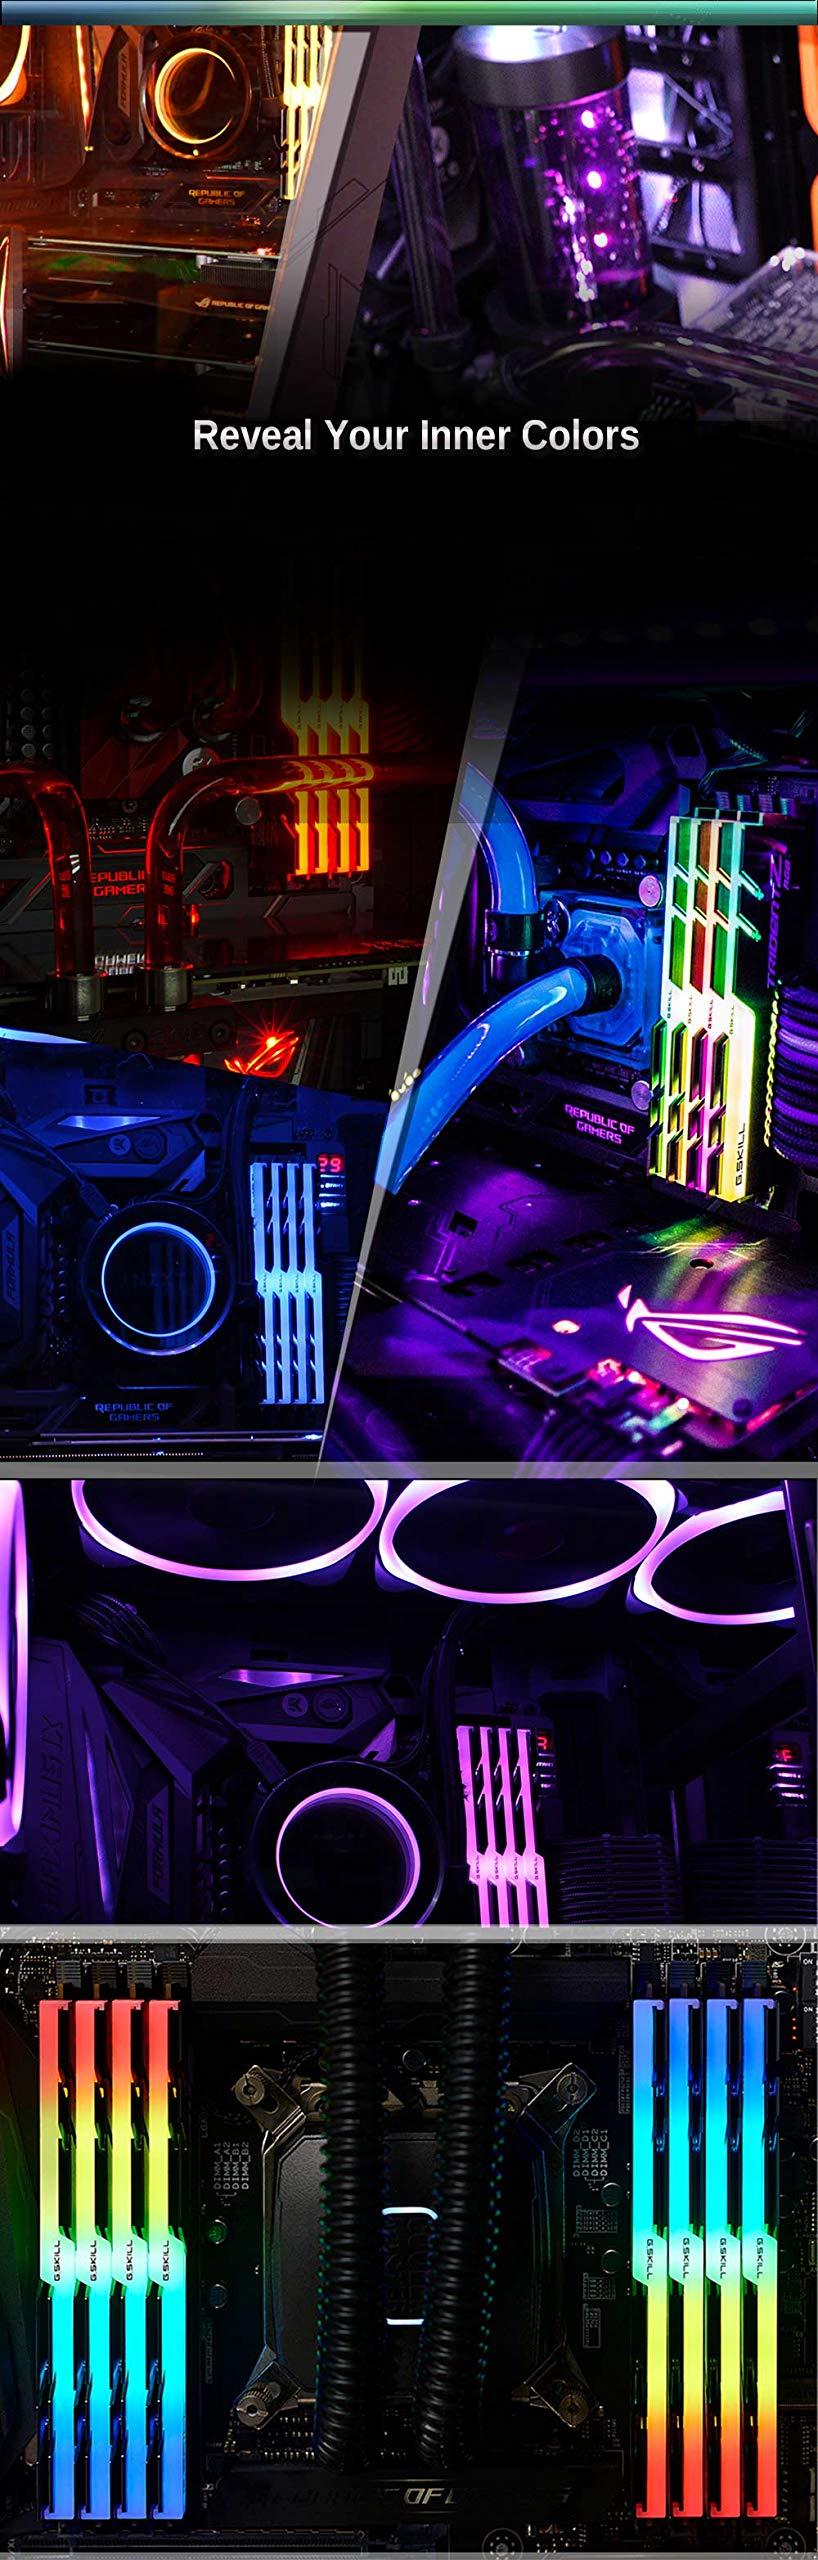 GSKILL-F4-3200C16D-16GTZR-Trident-Z-RGB-Series-16-GB-8-GB-x-2-DDR4-3200-MHz-PC4-25600-CL16-Dual-Channel-Memory-Kit-Black-with-full-length-RGB-LED-light-bar